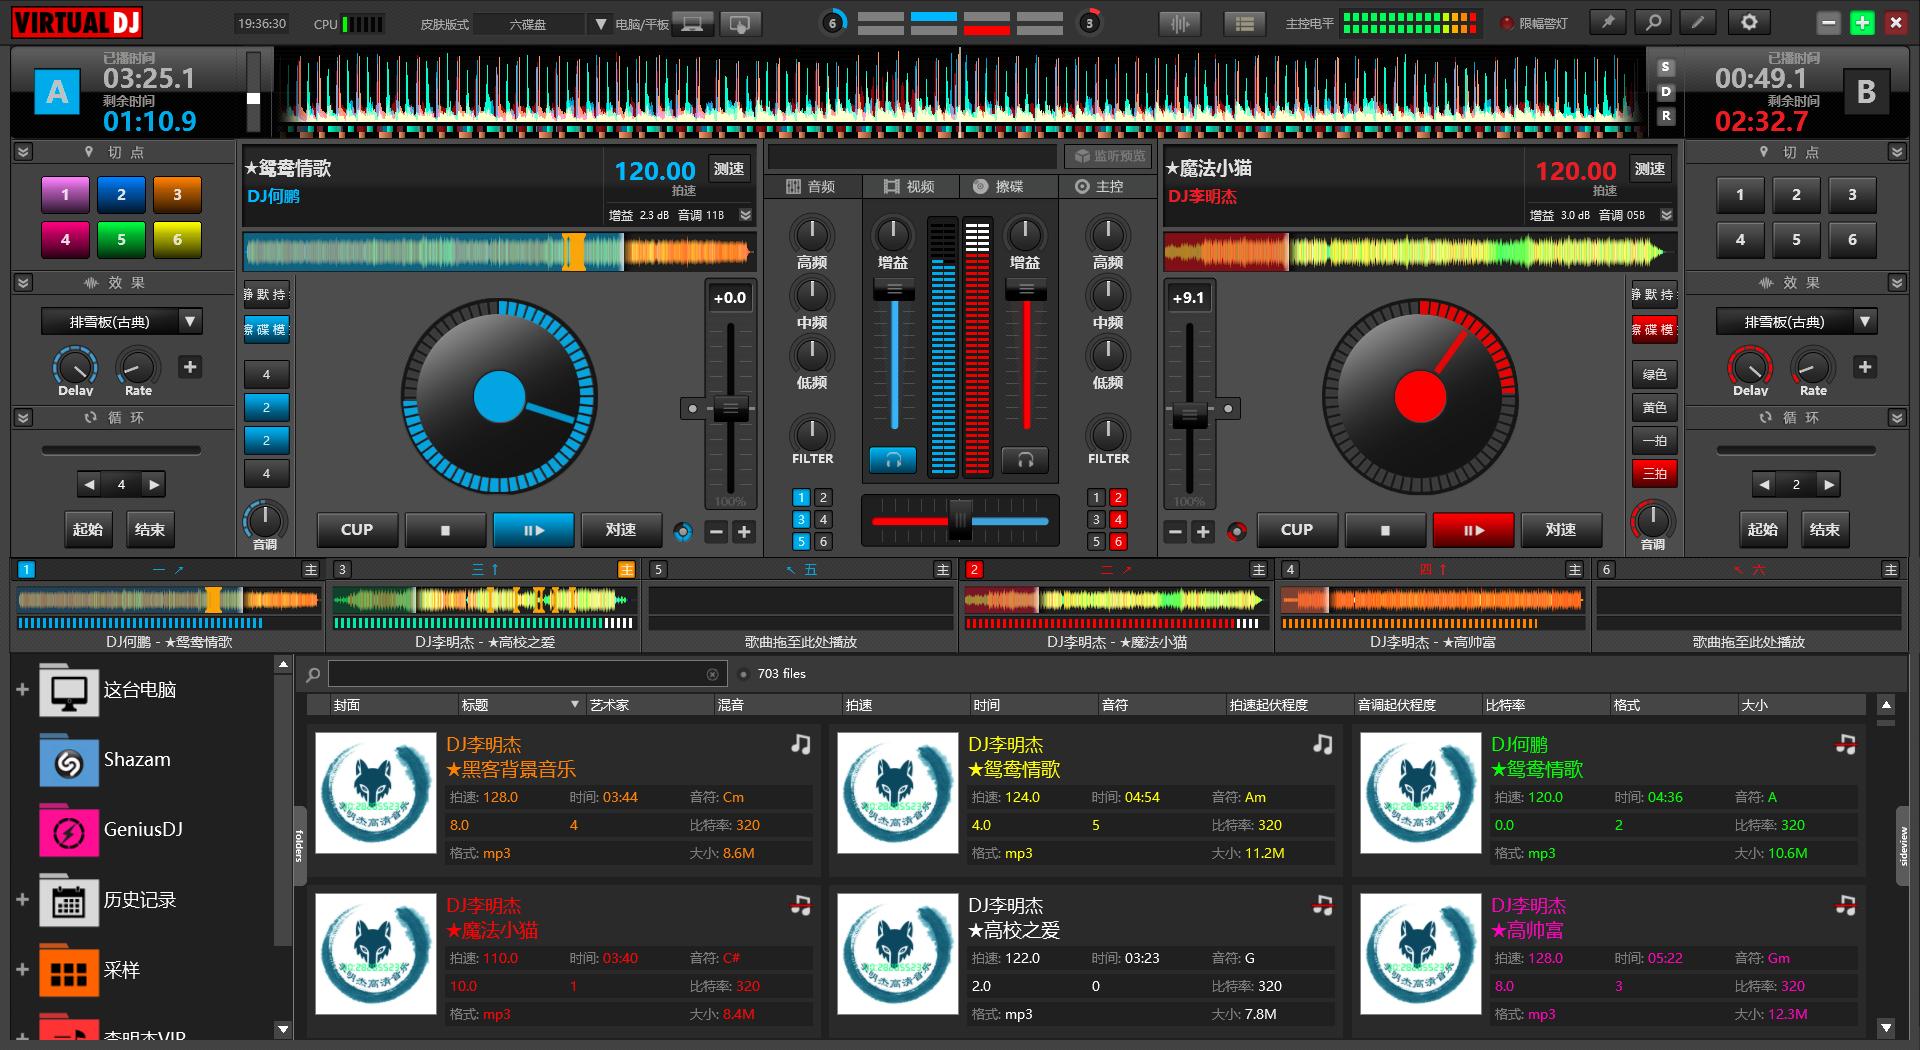 Latest virtual dj pro